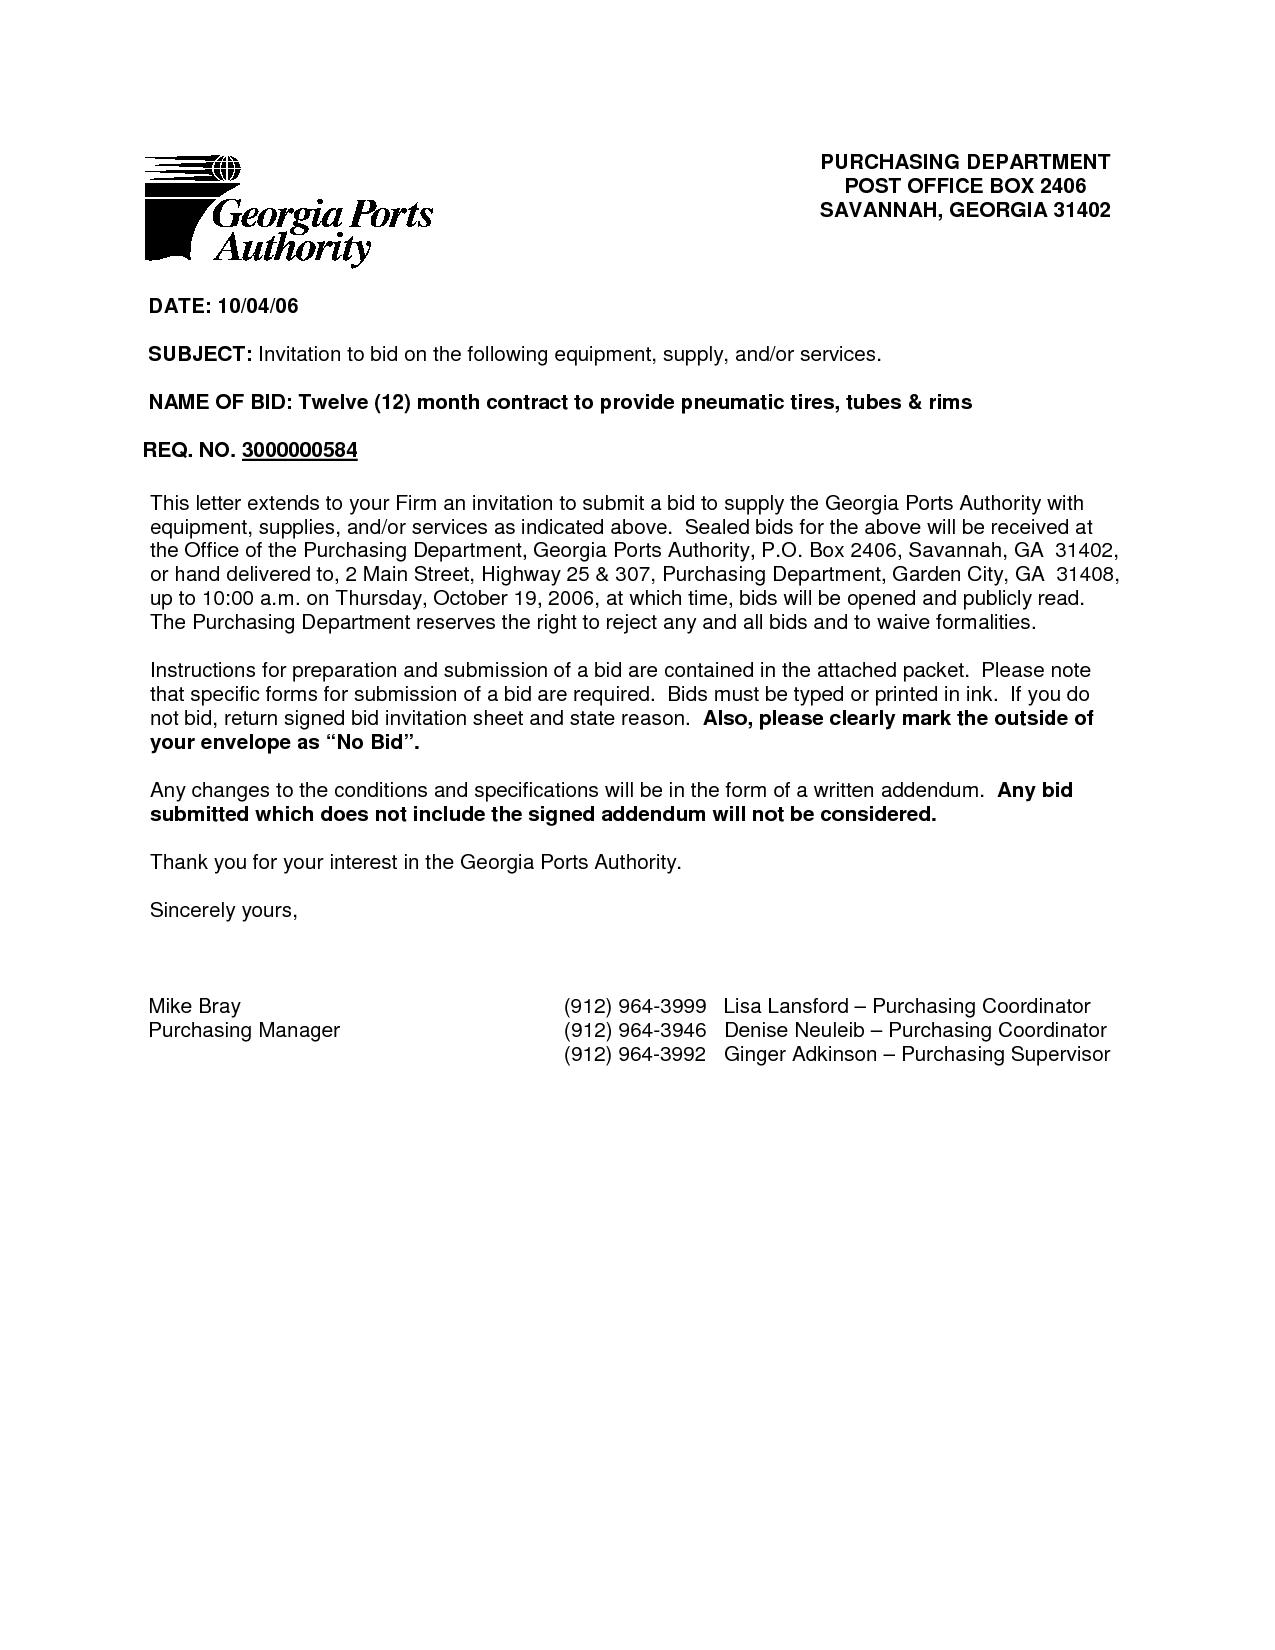 Construction Bid Cover Letter